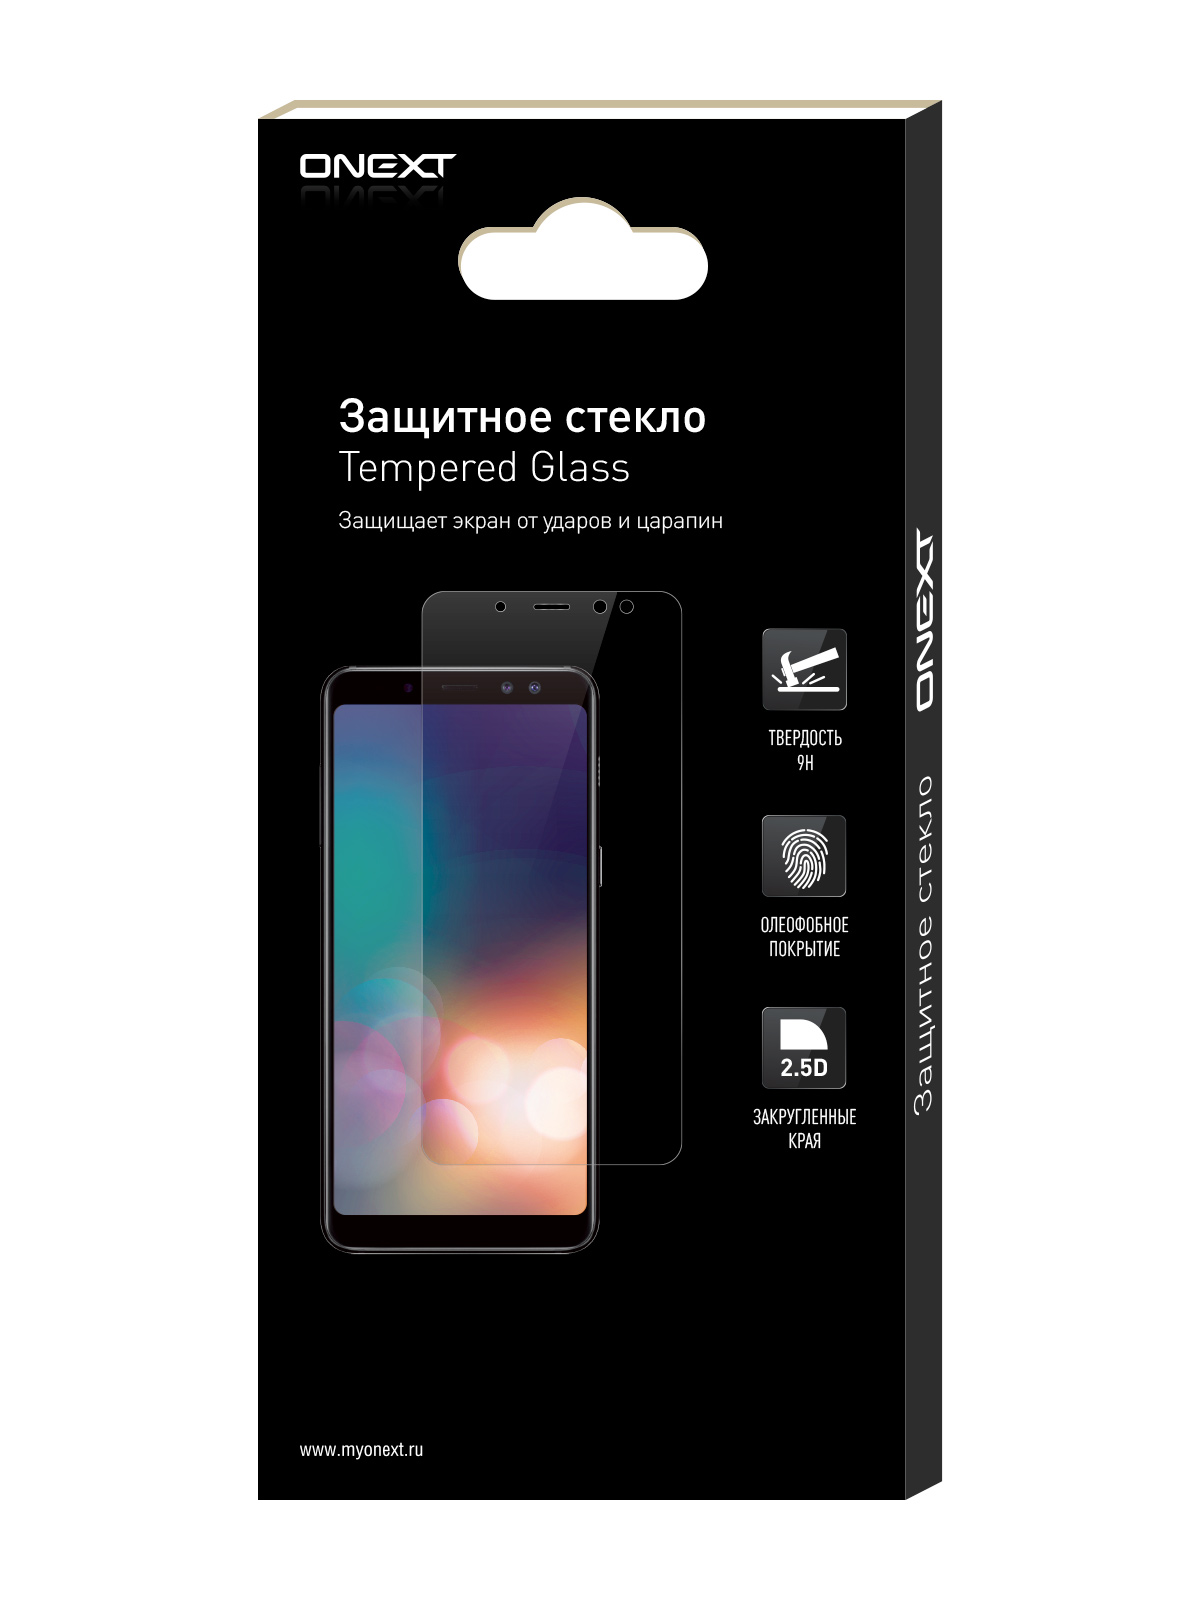 Защитное стекло ONEXT для Apple iPhone X